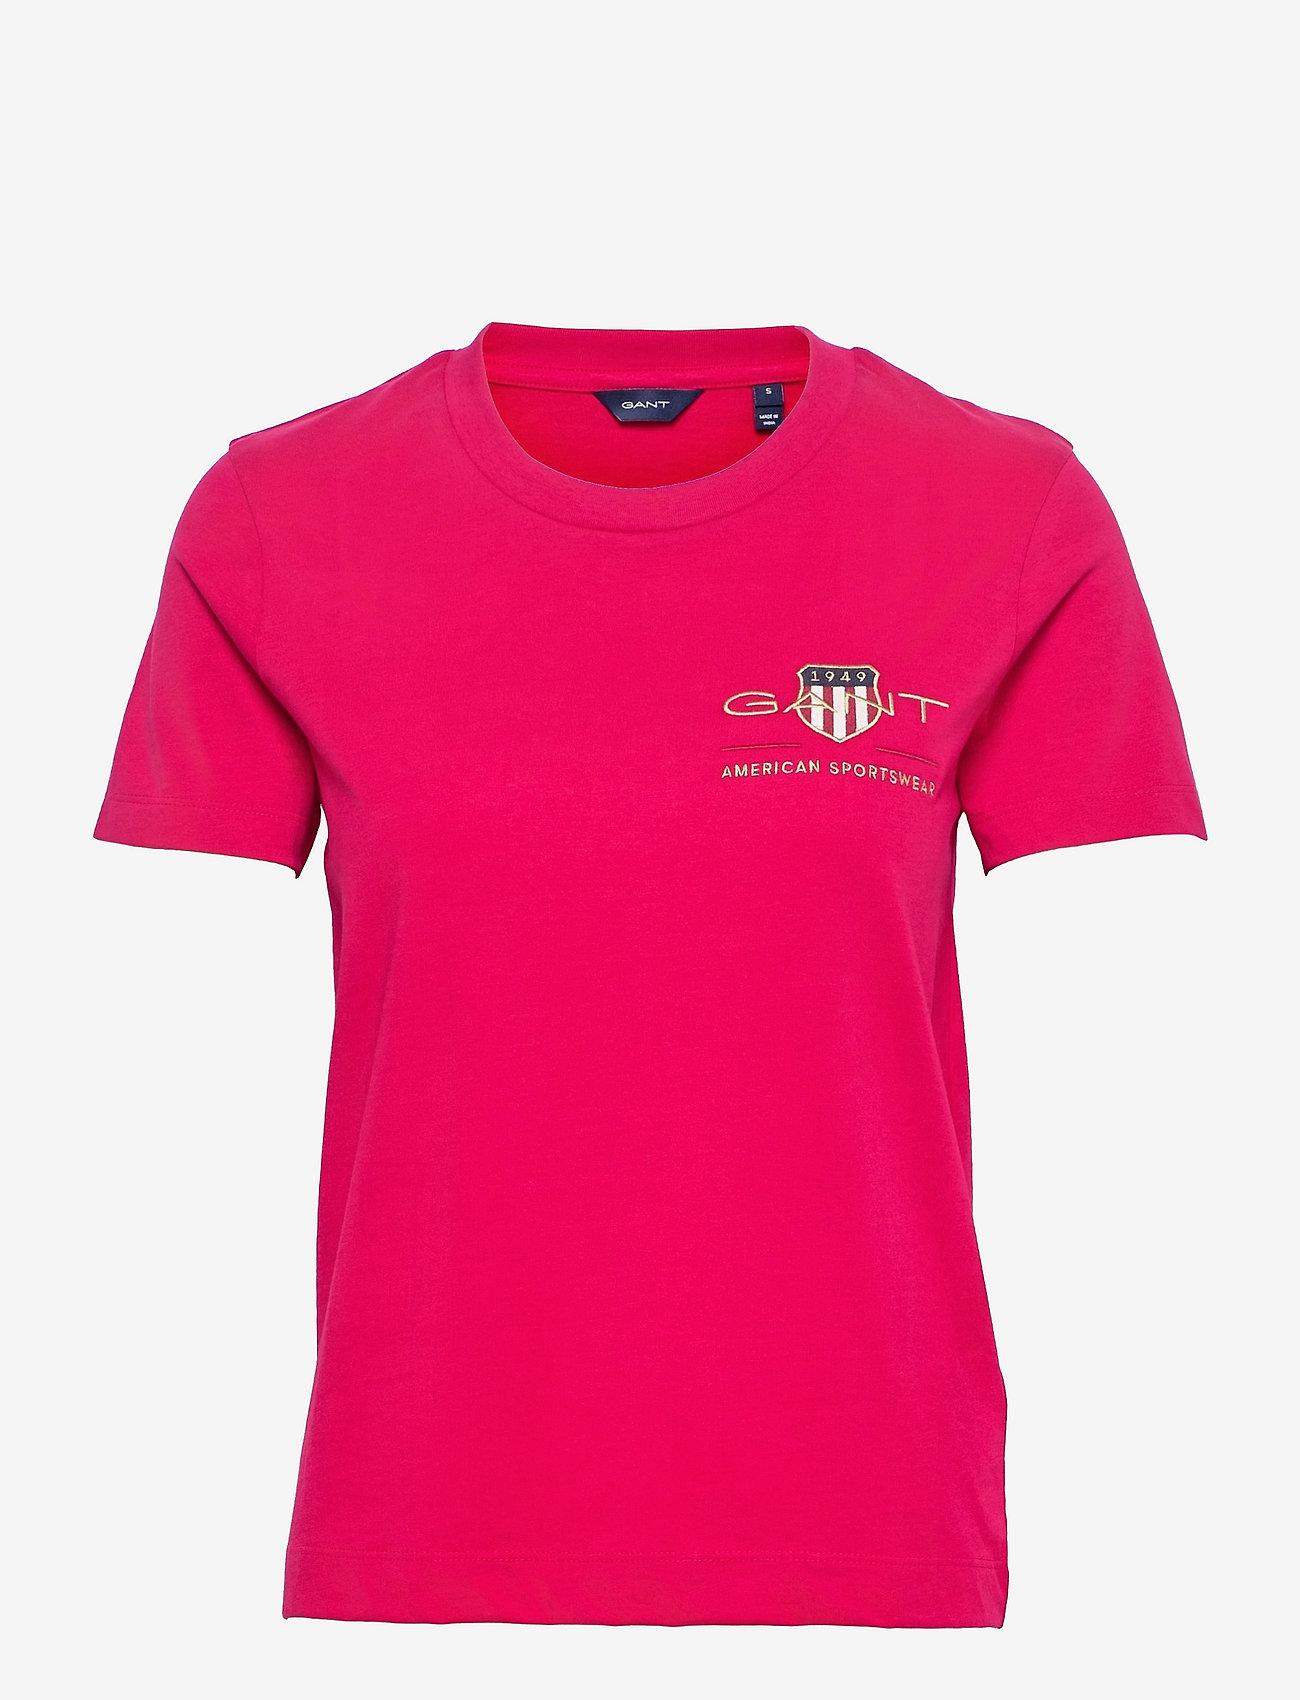 GANT - ARCHIVE SHIELD SS T-SHIRT - t-shirts - raspberry red - 0